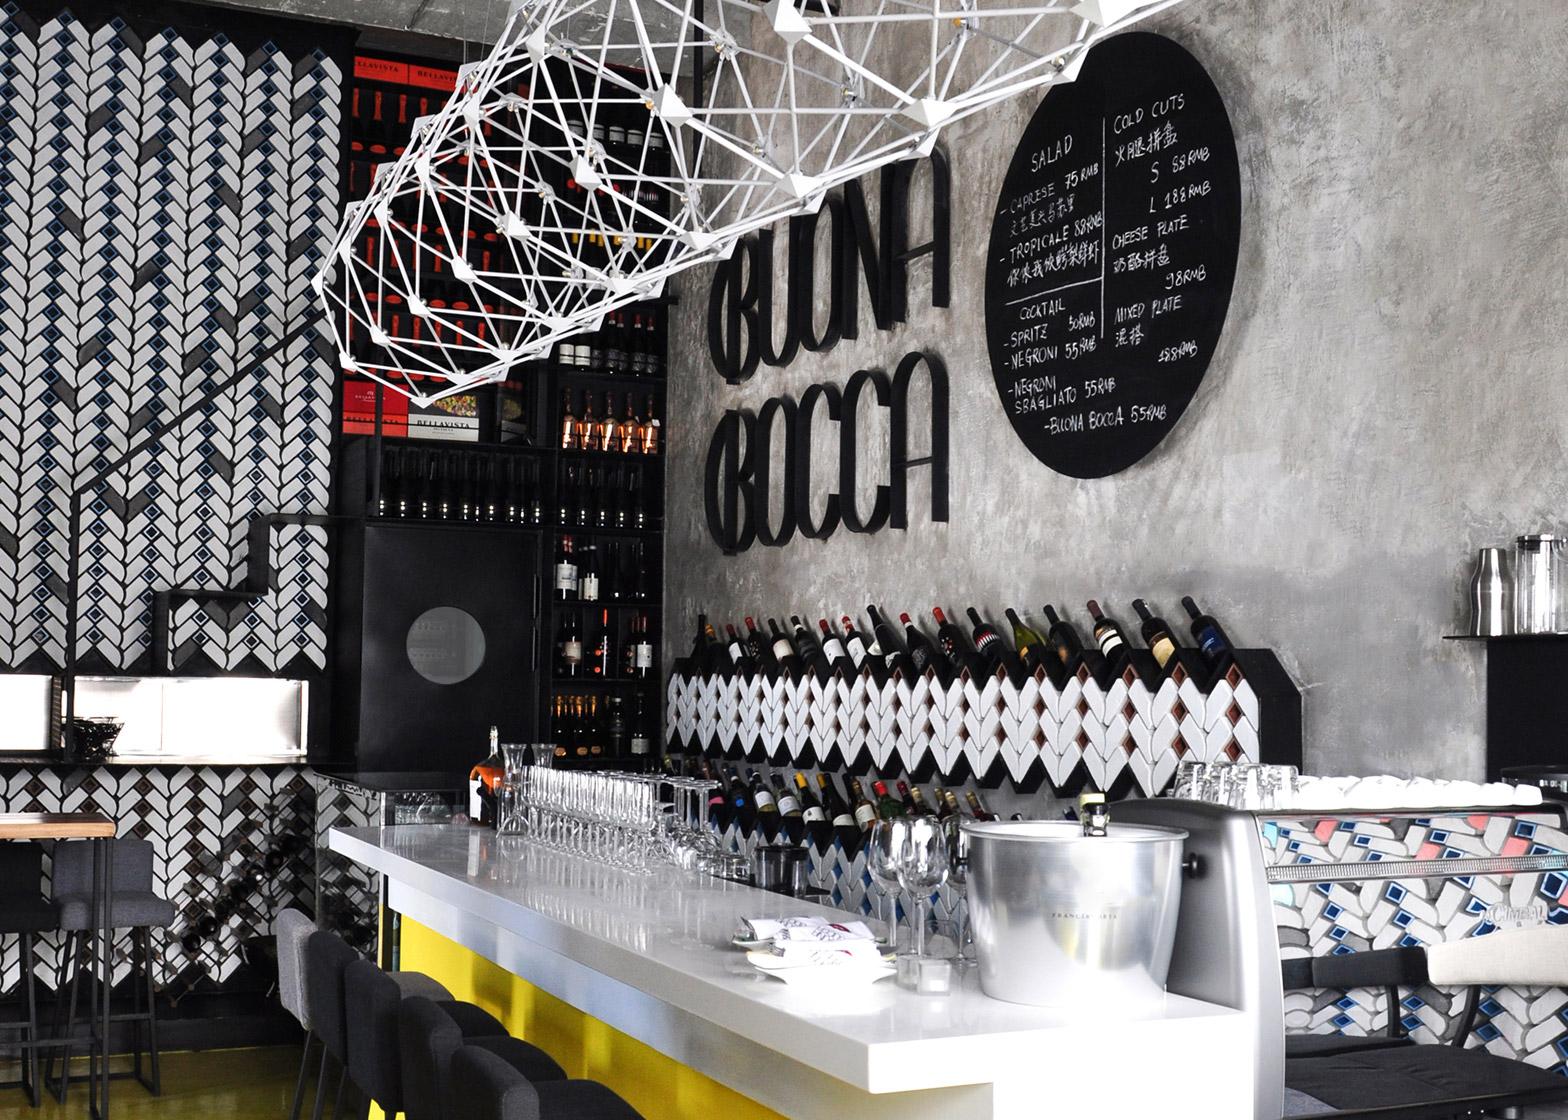 Ranoprimo wine bar in Beijing